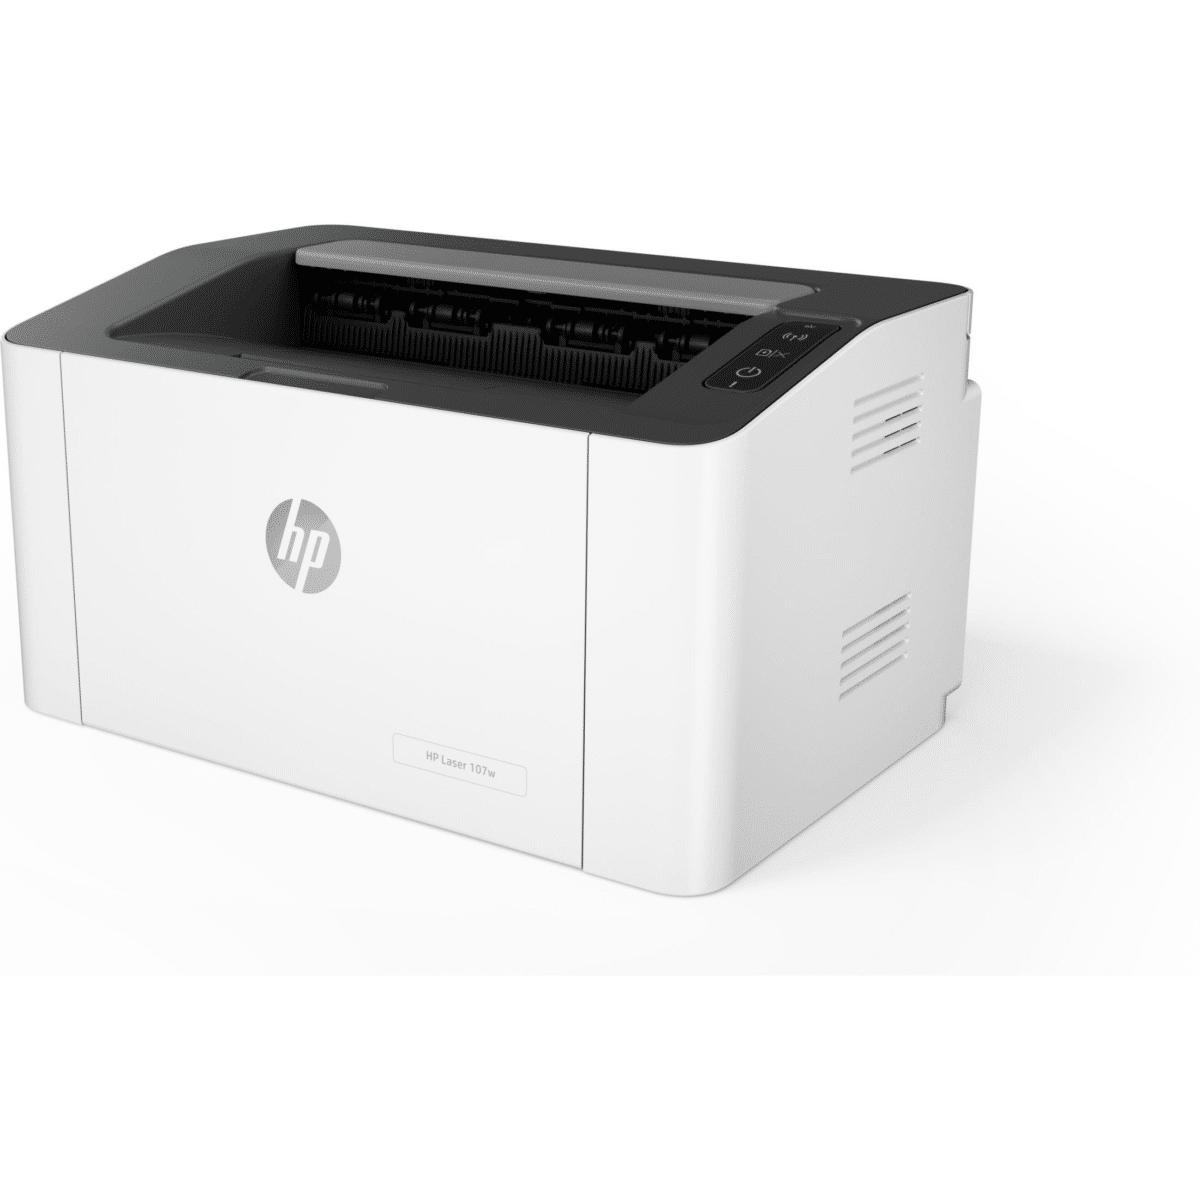 HP Laser 107w Mono A4 Duplex Laser Printer 4ZB78A